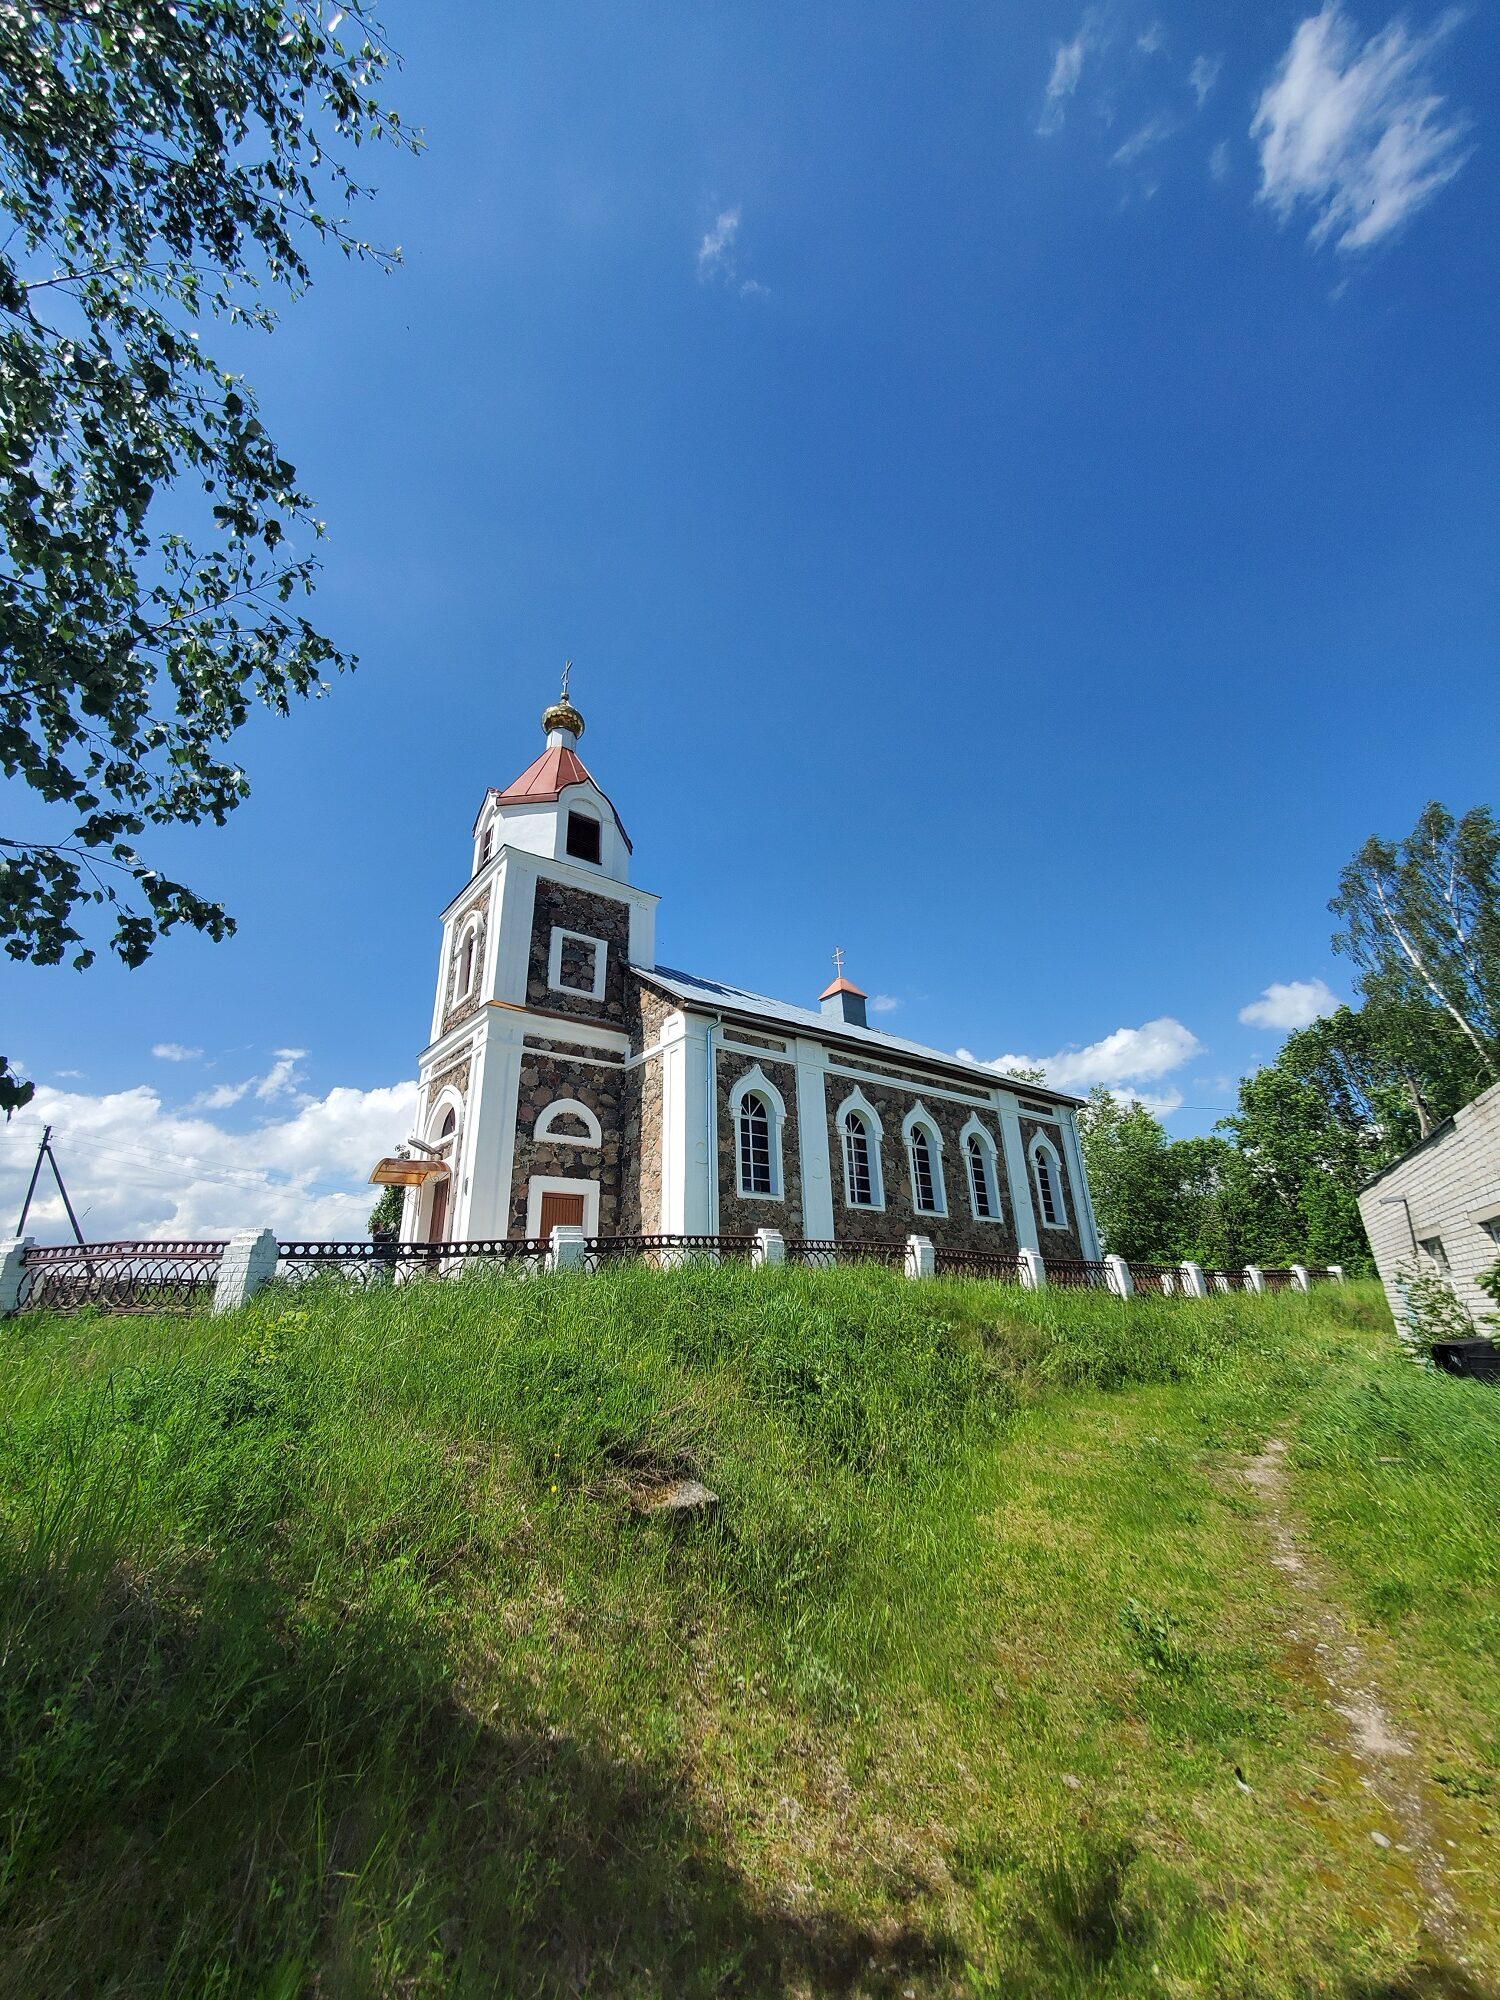 20200606 140803 rotated - Храм Рождества Иоанна Предтечи в деревне Груздово